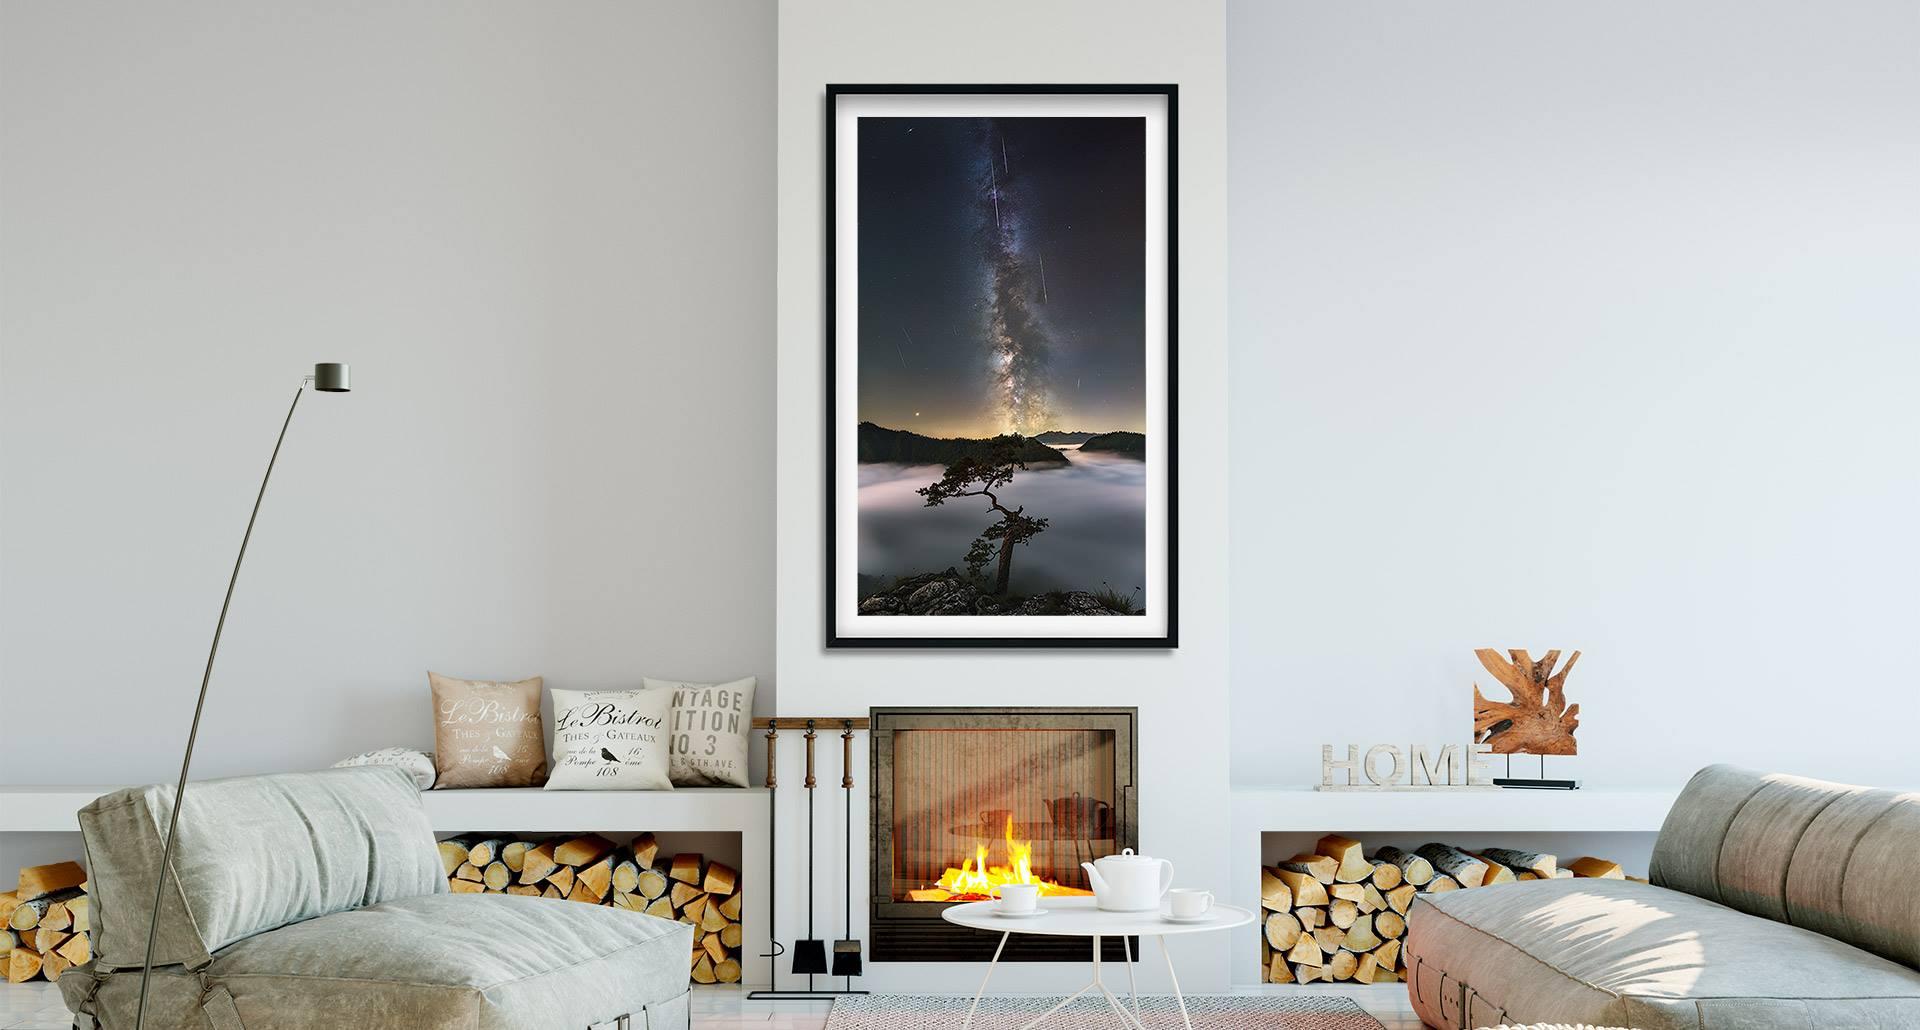 Wydruk Fine-Art od astrography.com